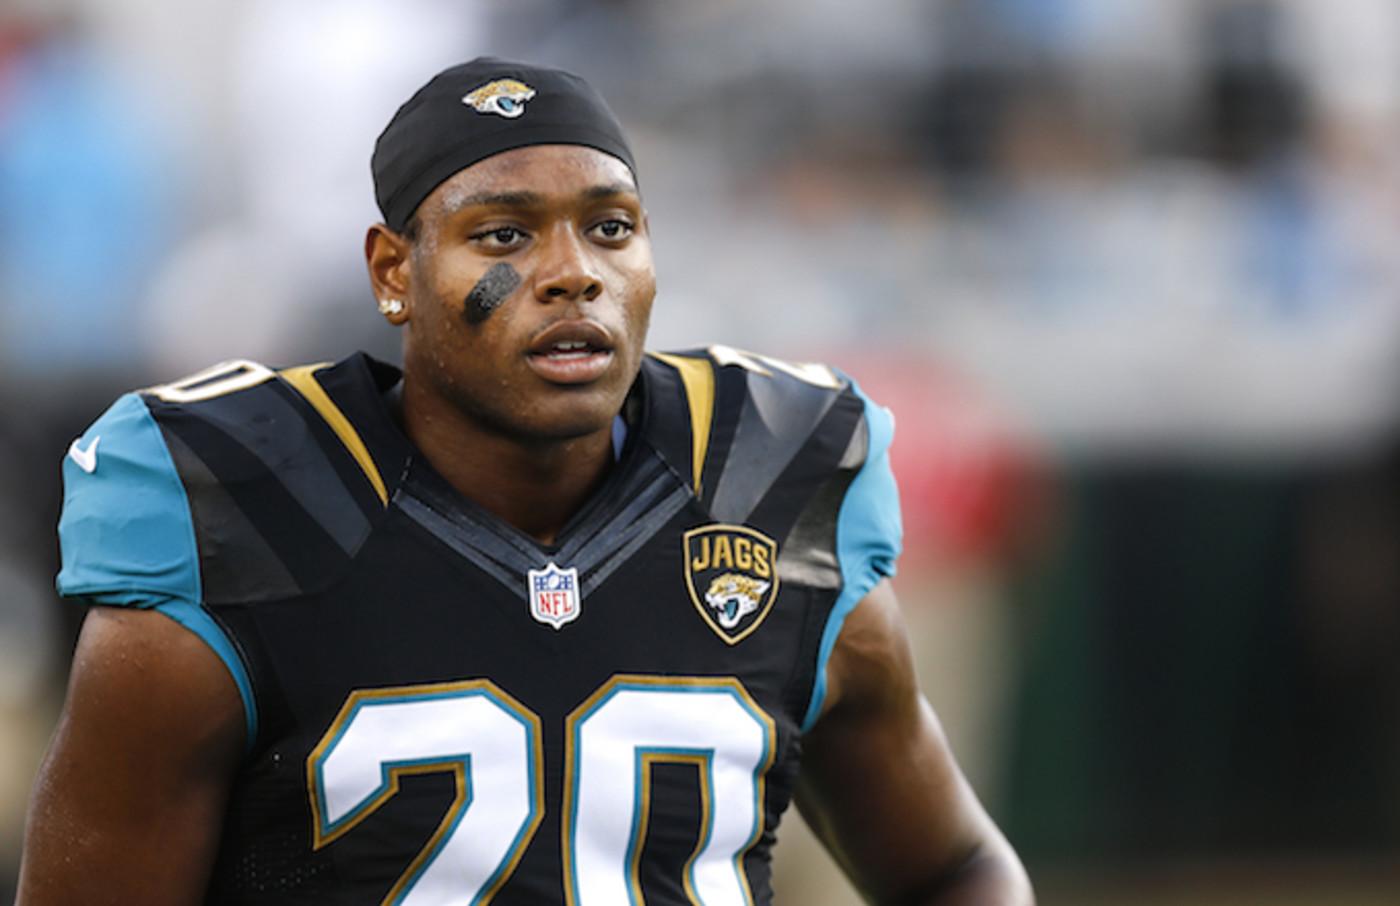 Cornerback Jalen Ramsey #20 of the Jacksonville Jaguars.